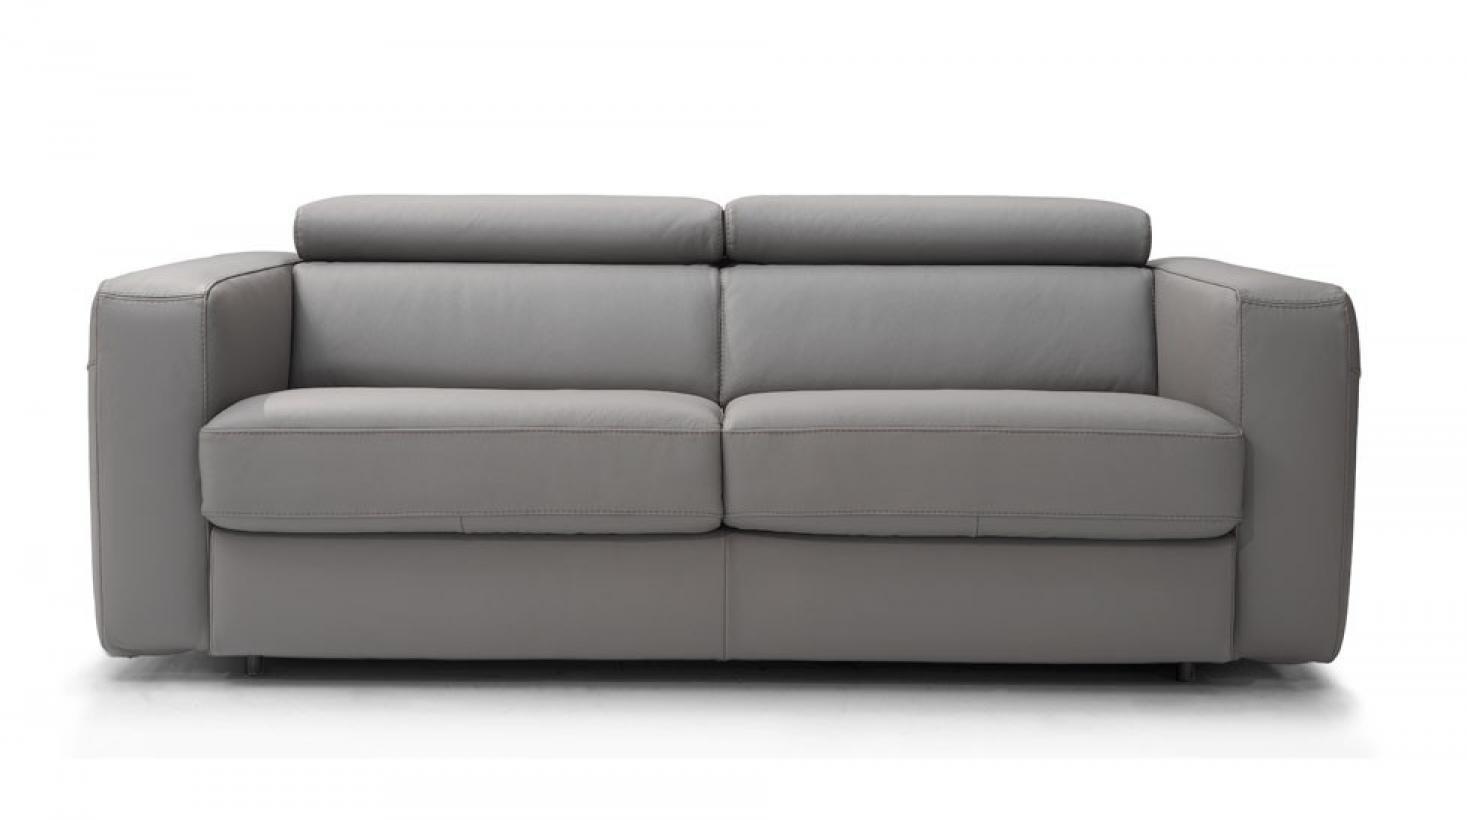 photos canap convertible pas cher en cuir. Black Bedroom Furniture Sets. Home Design Ideas